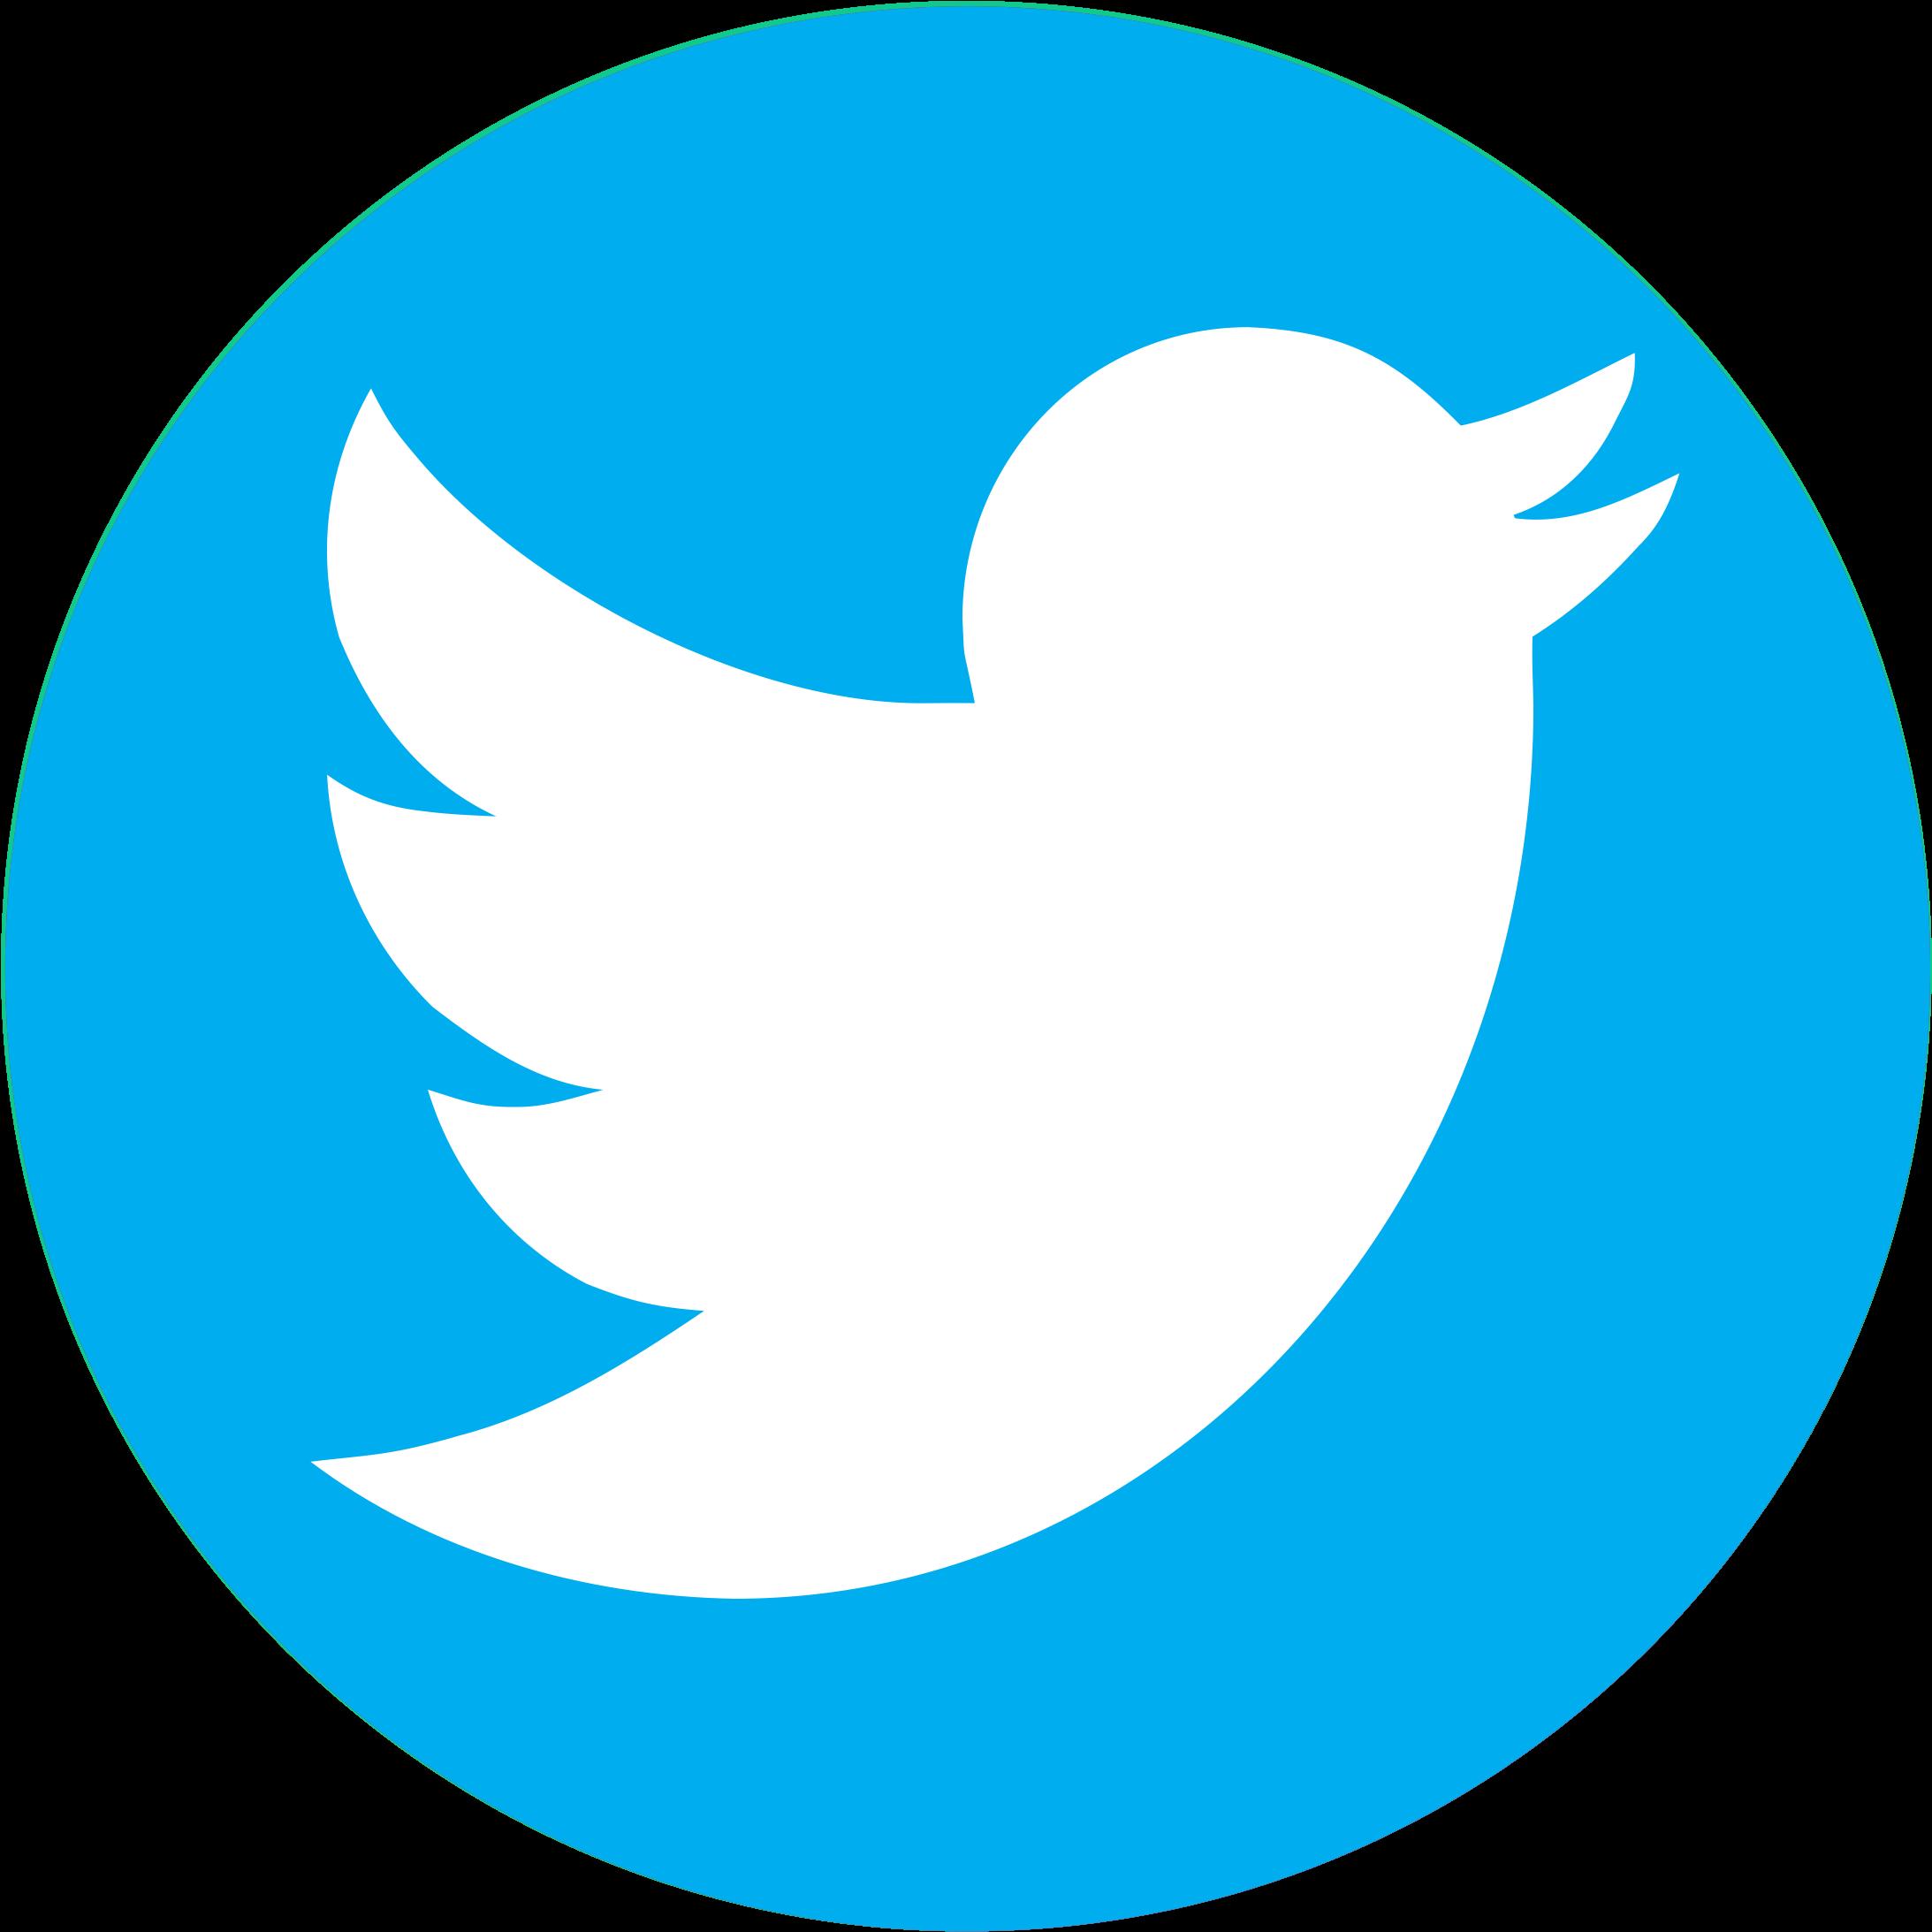 pngkey.com-twitter-logo-png-transparent-27646